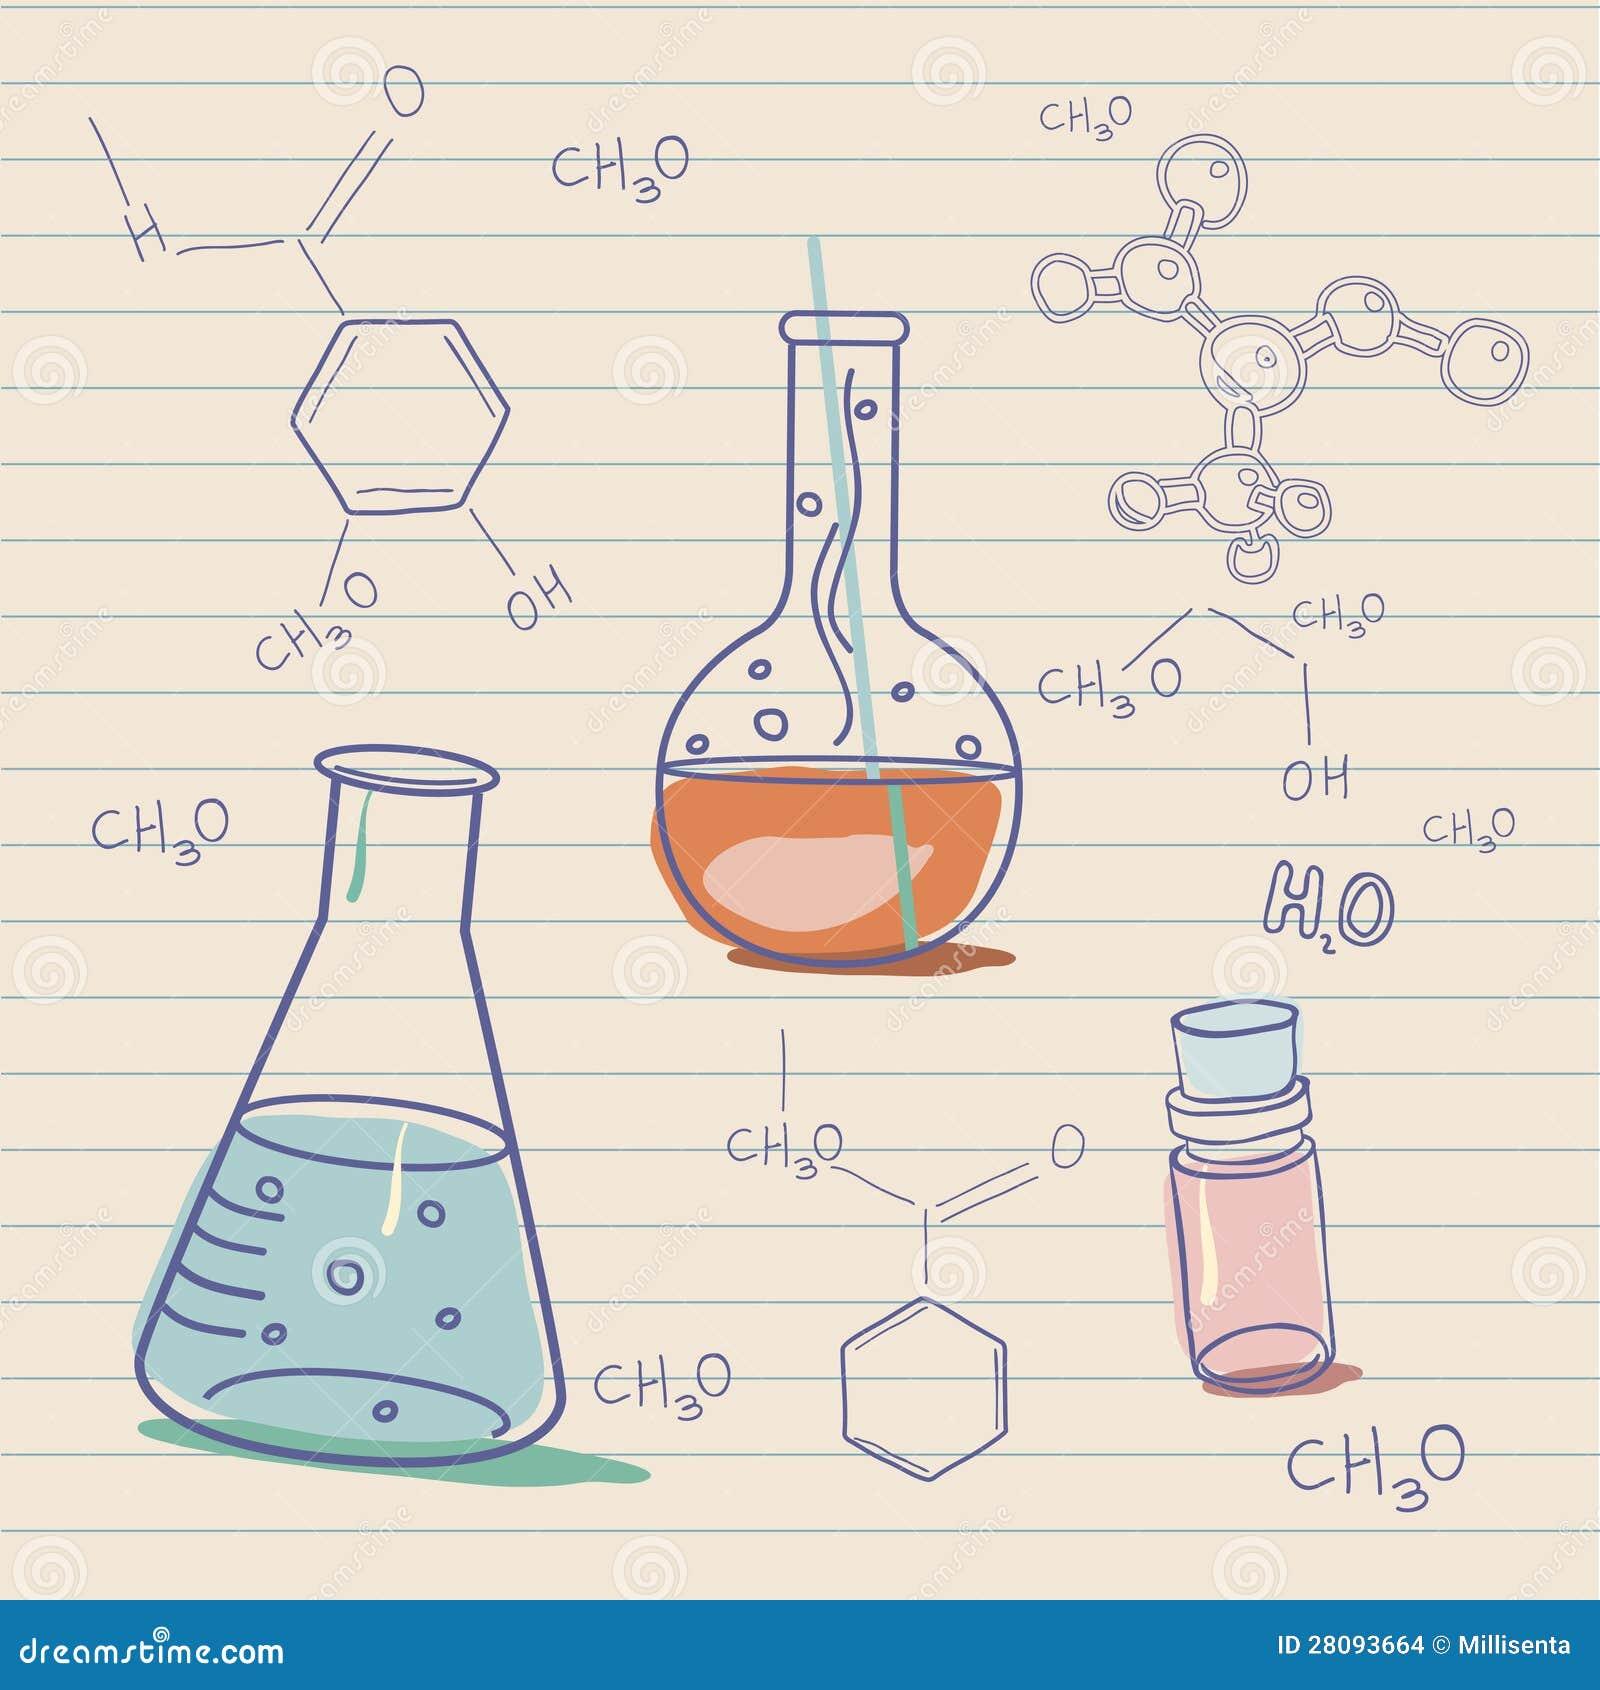 Как рисуют химию